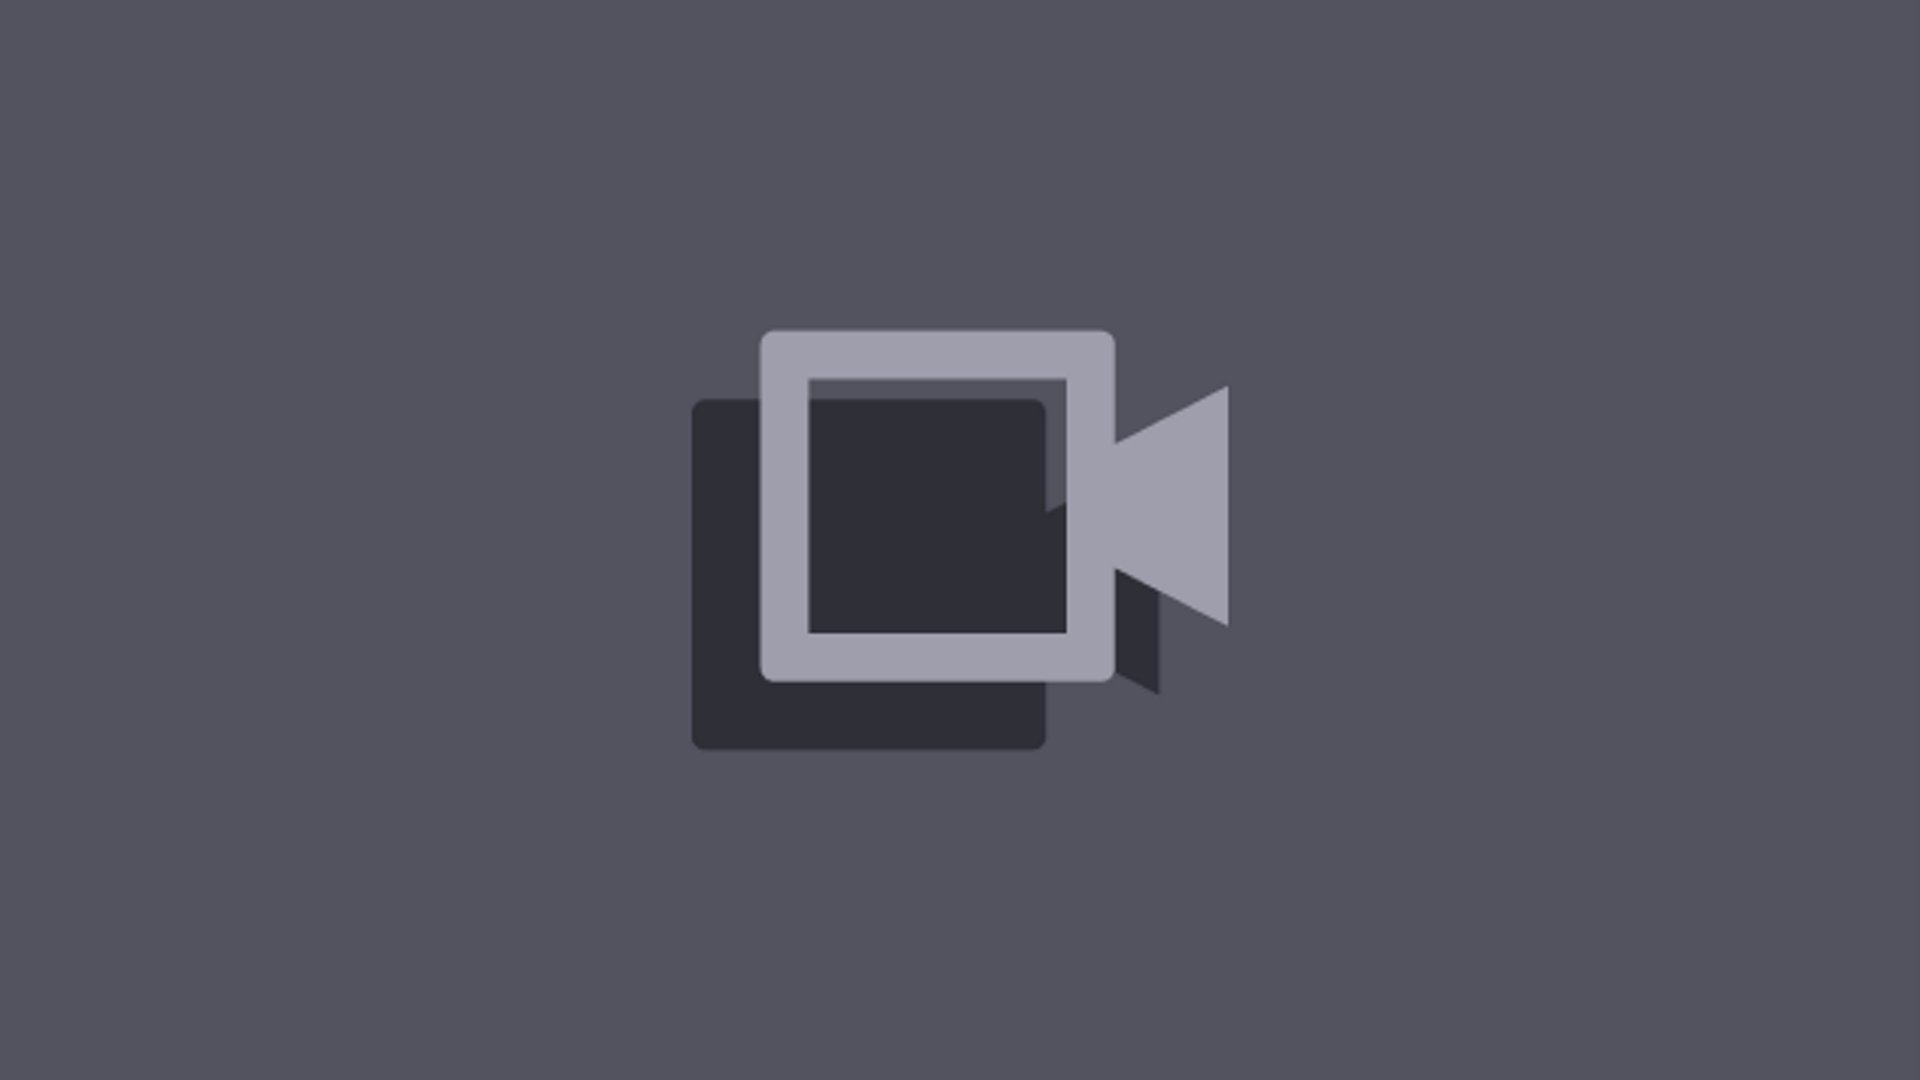 nlyfe-channel_offline_image-68a0a5eab418